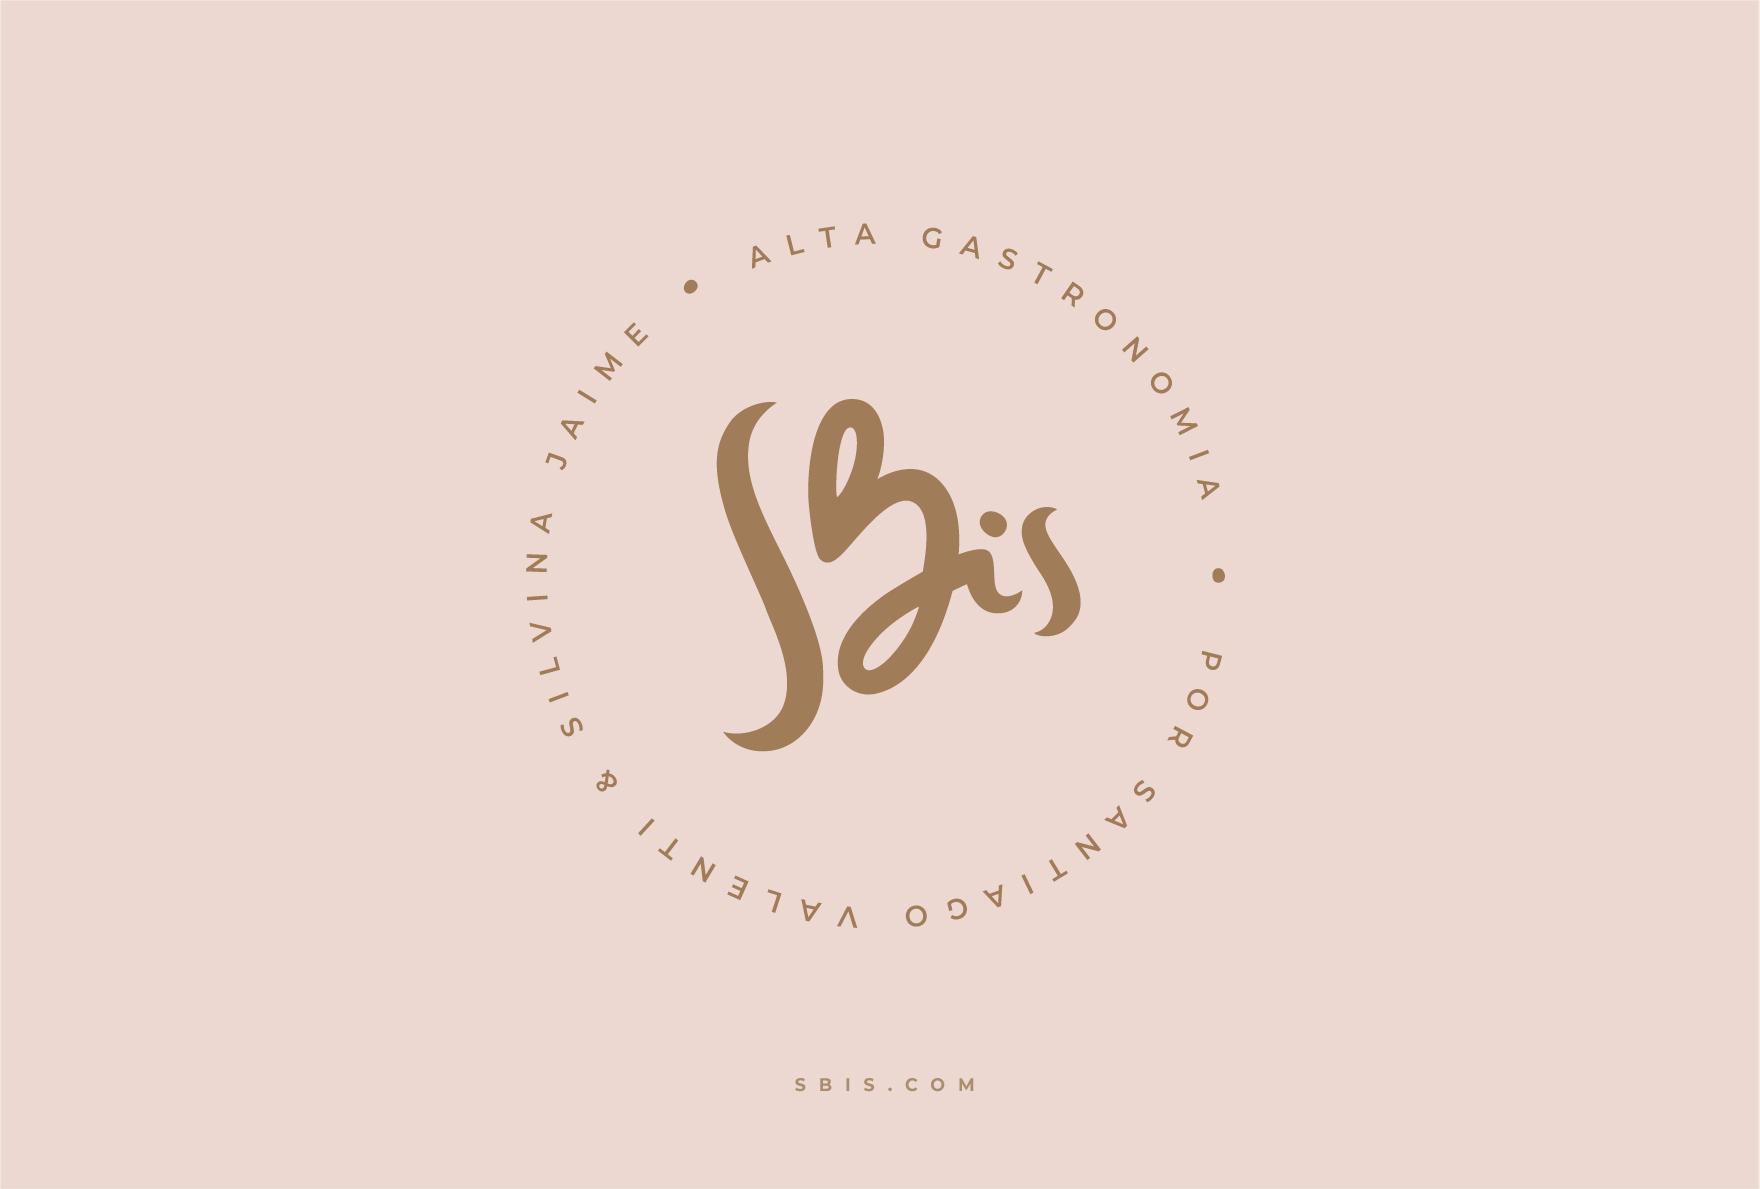 tira_sbis-06